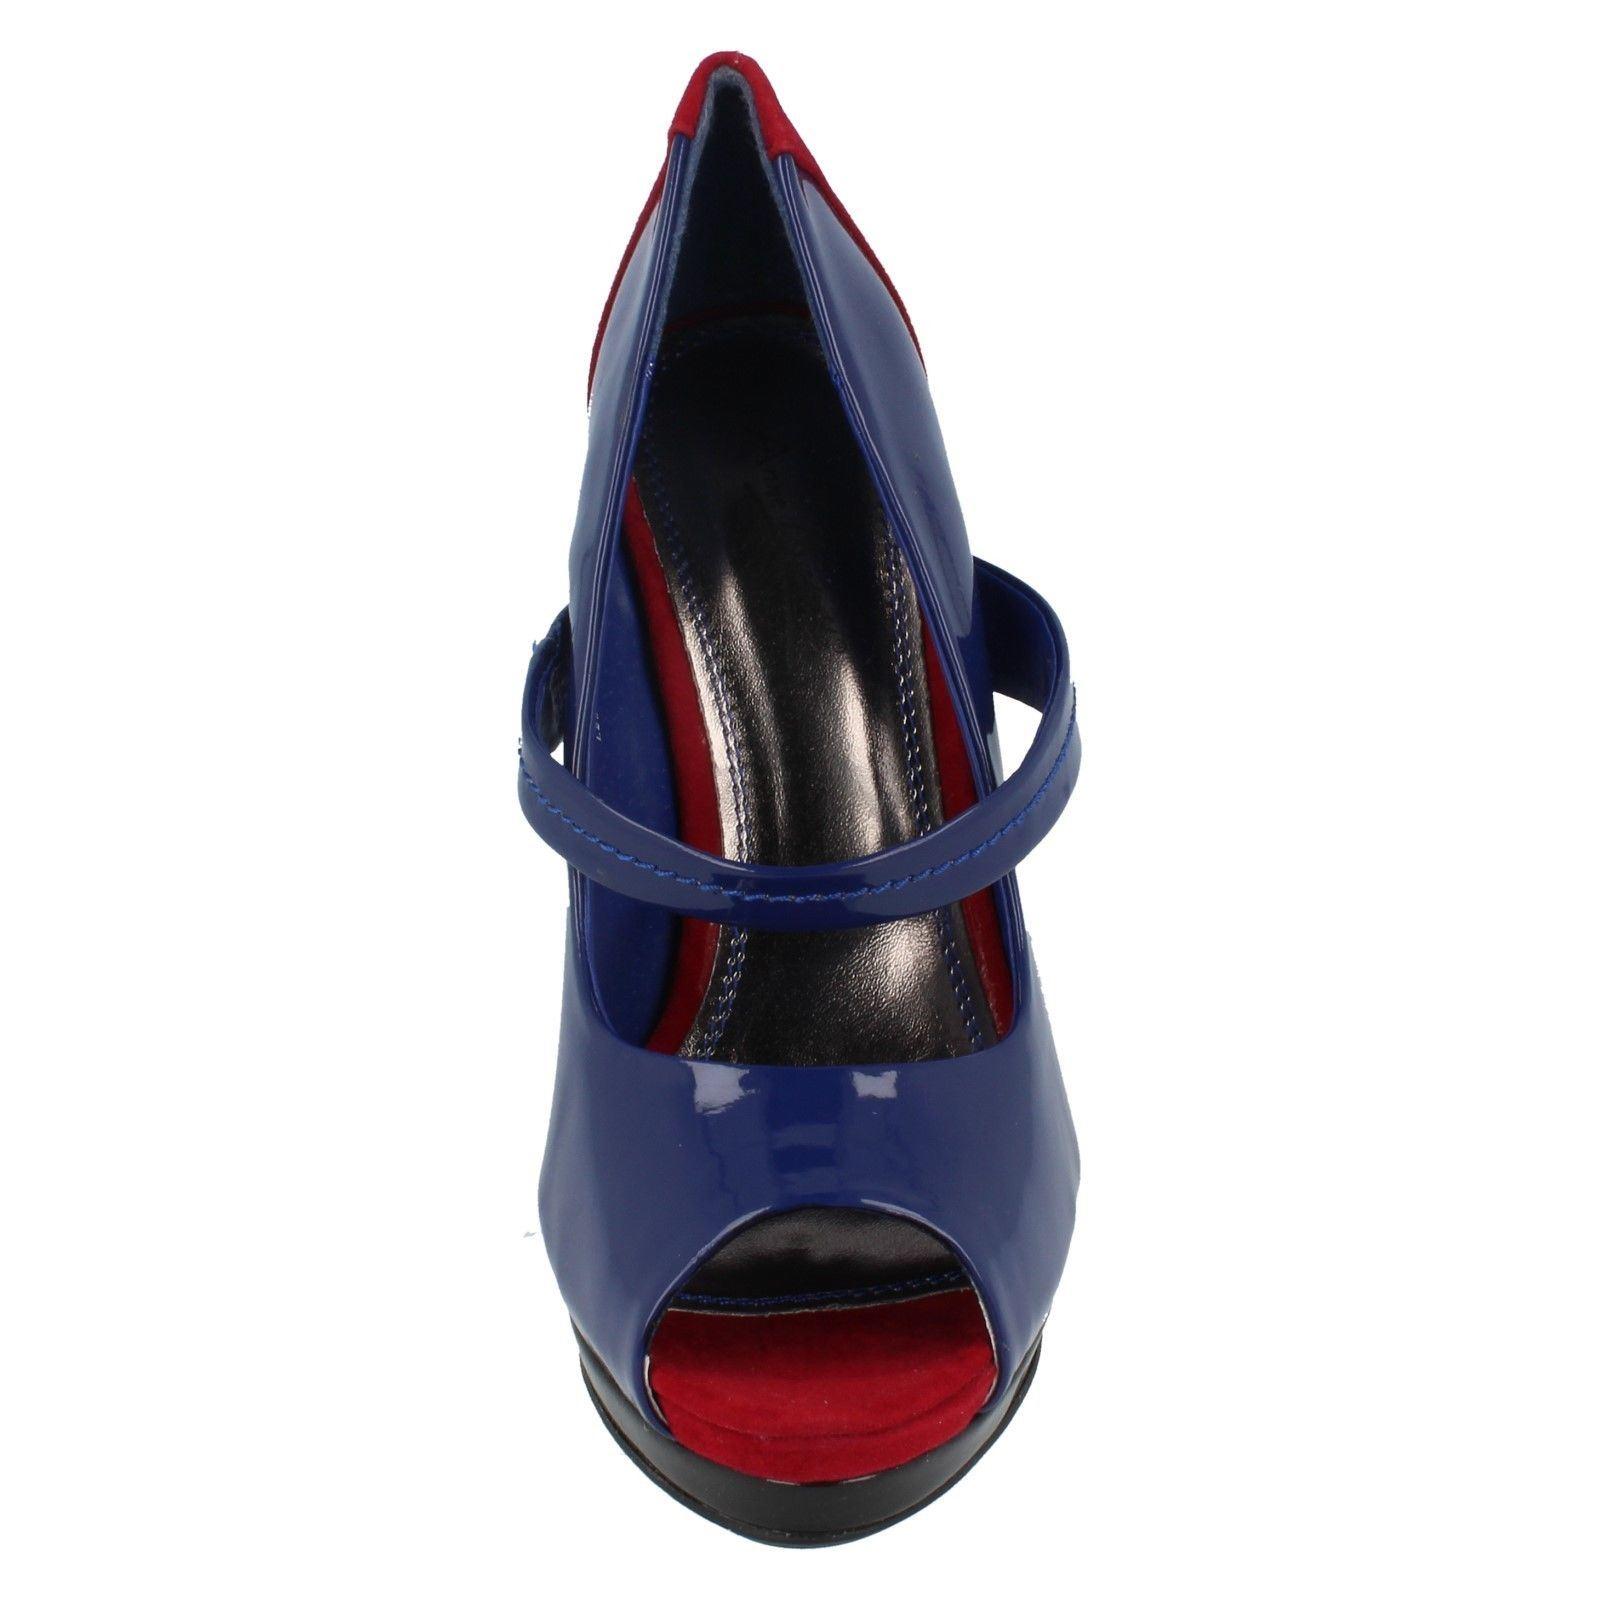 Damas Anne Michelle Punta Abierta Zapatos Etiqueta L2973 ~ N